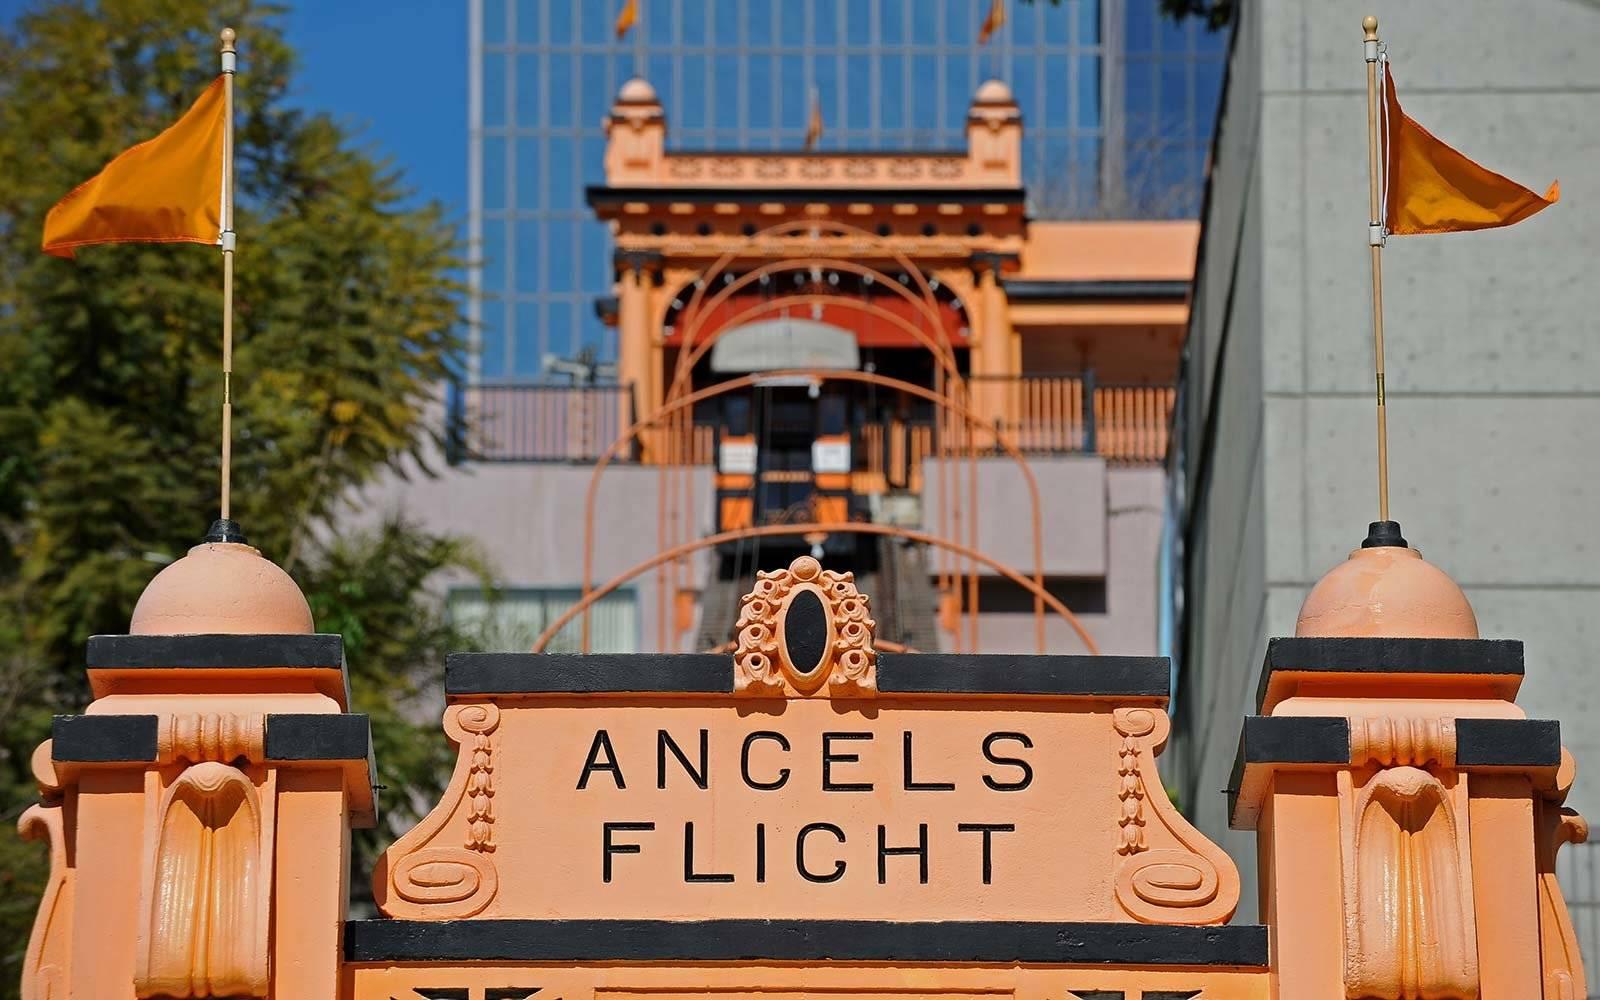 Angels Flight Railway